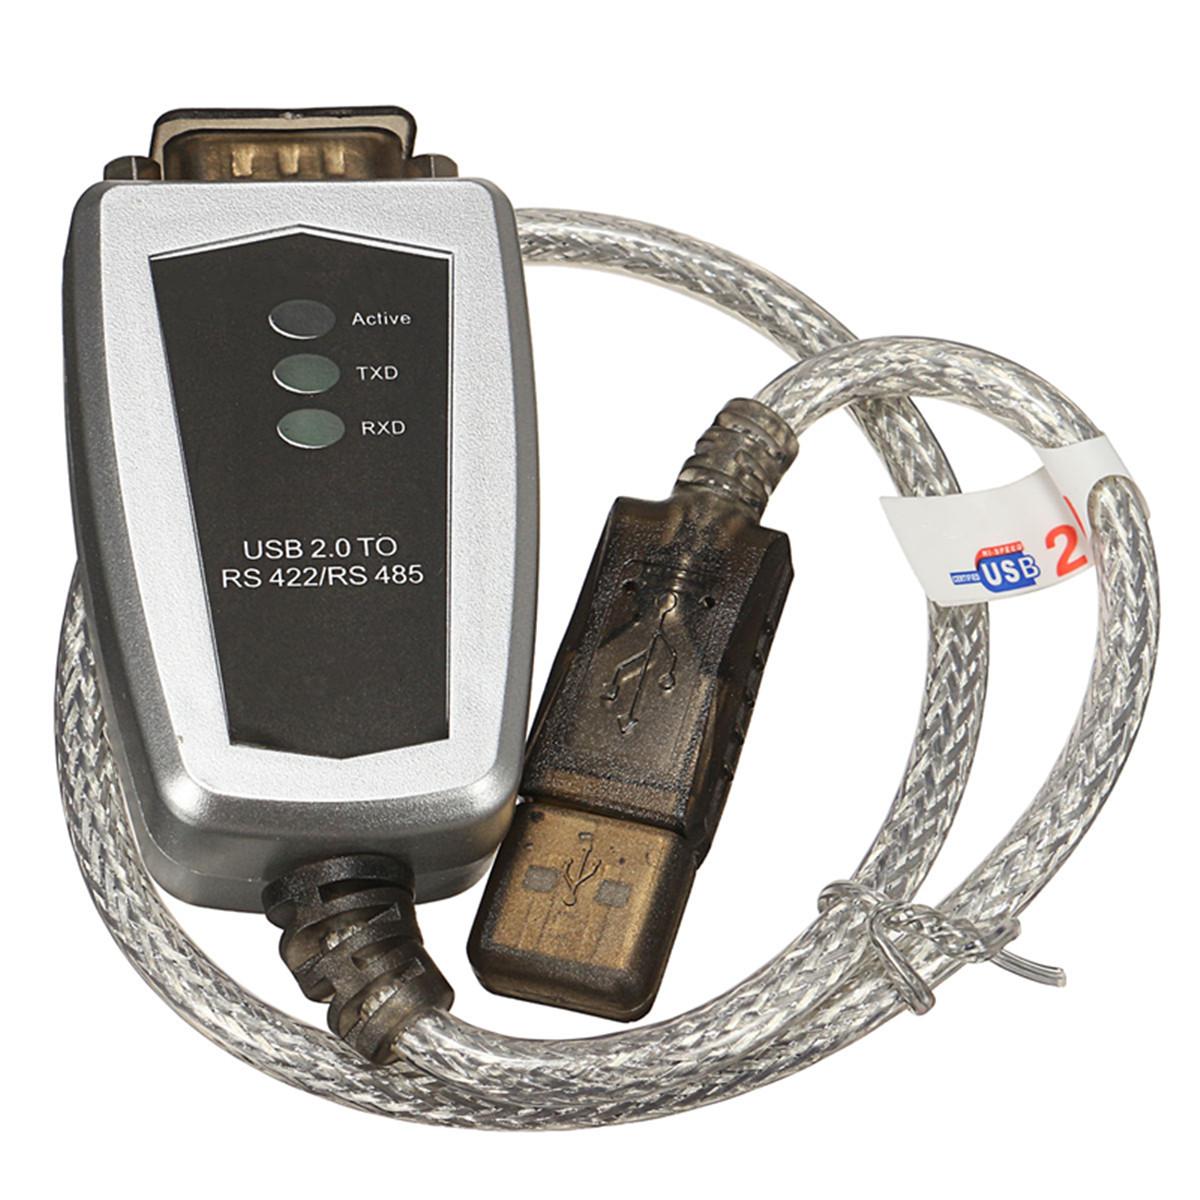 USB до RS485 RS422 Последовательный DB9 к переходному кабелю последовательного преобразователя Termi - фото 2